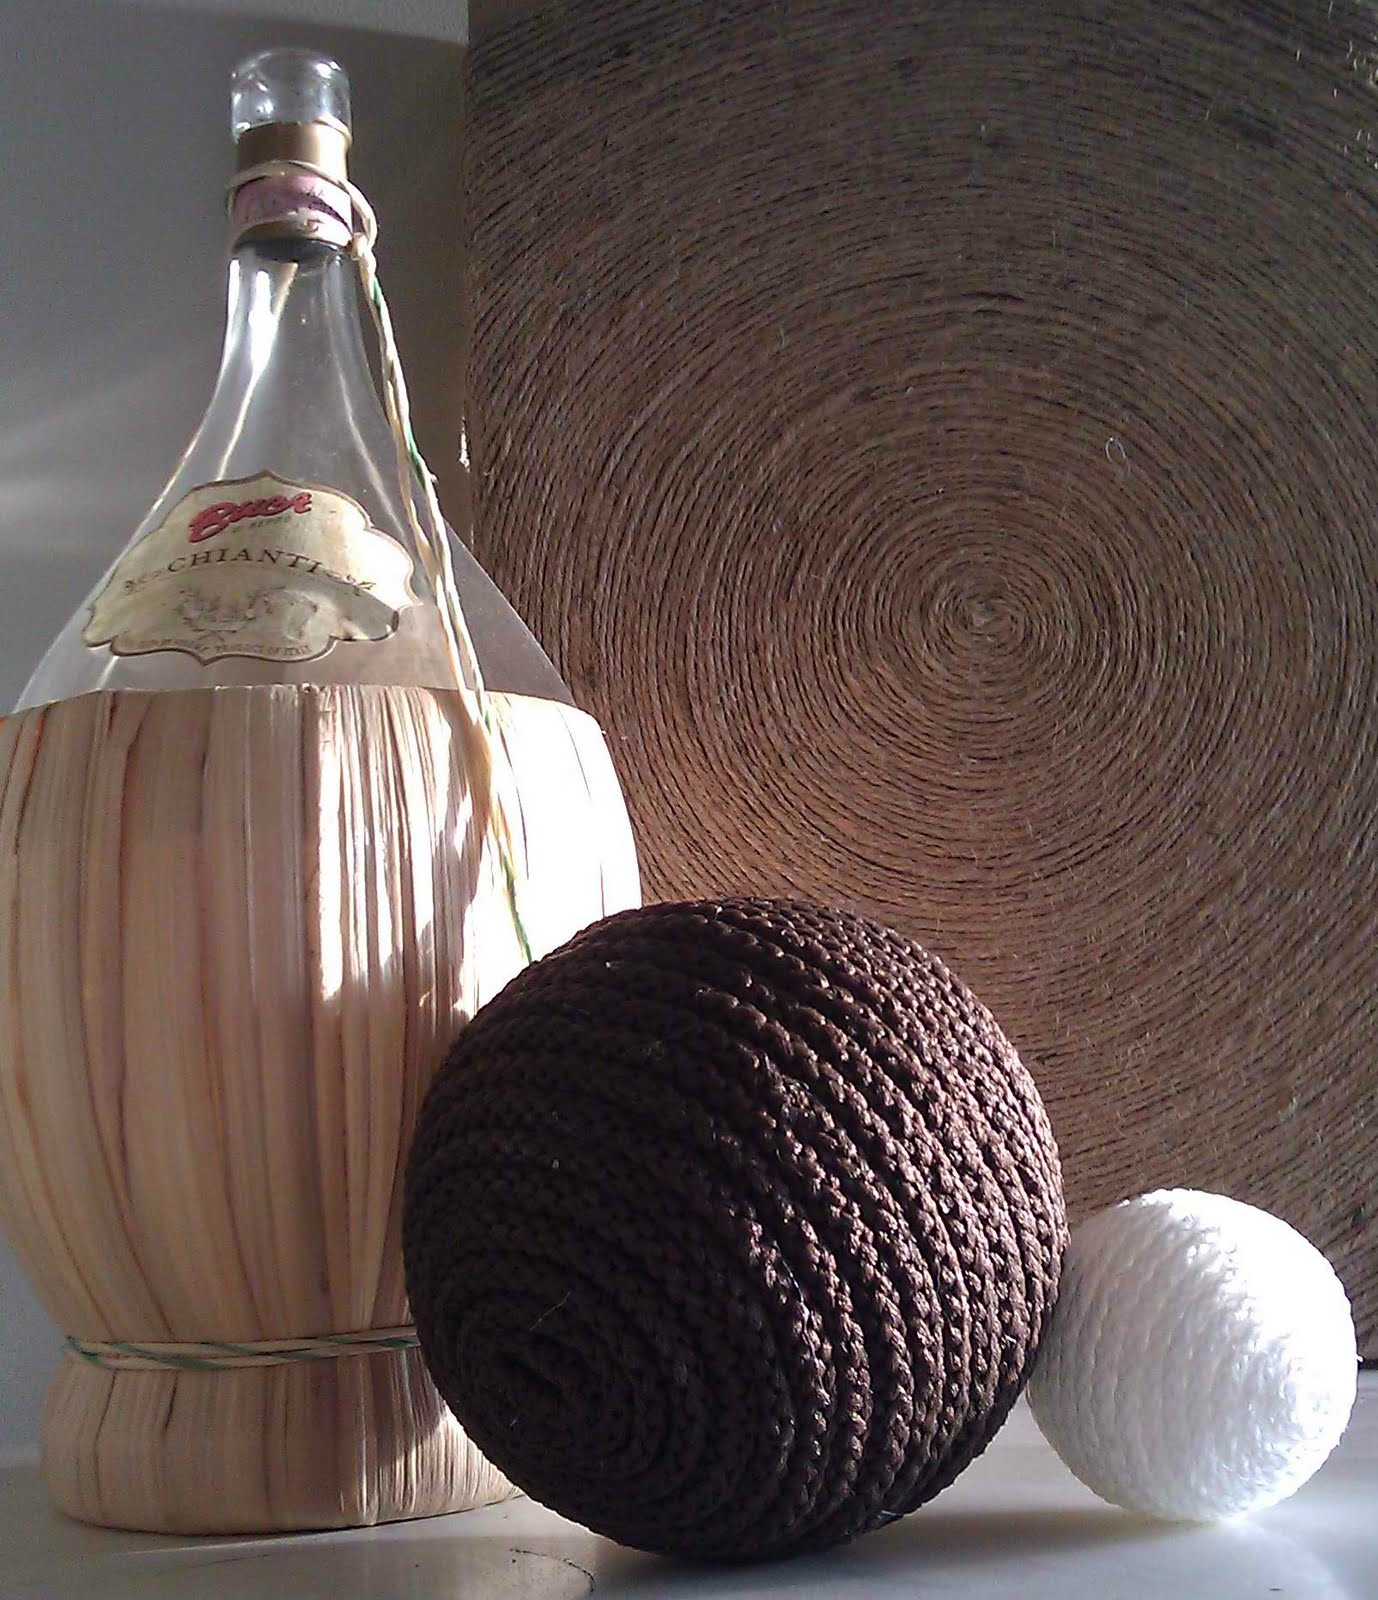 Live to Love to Craft: DIY Home Decor Balls & Box